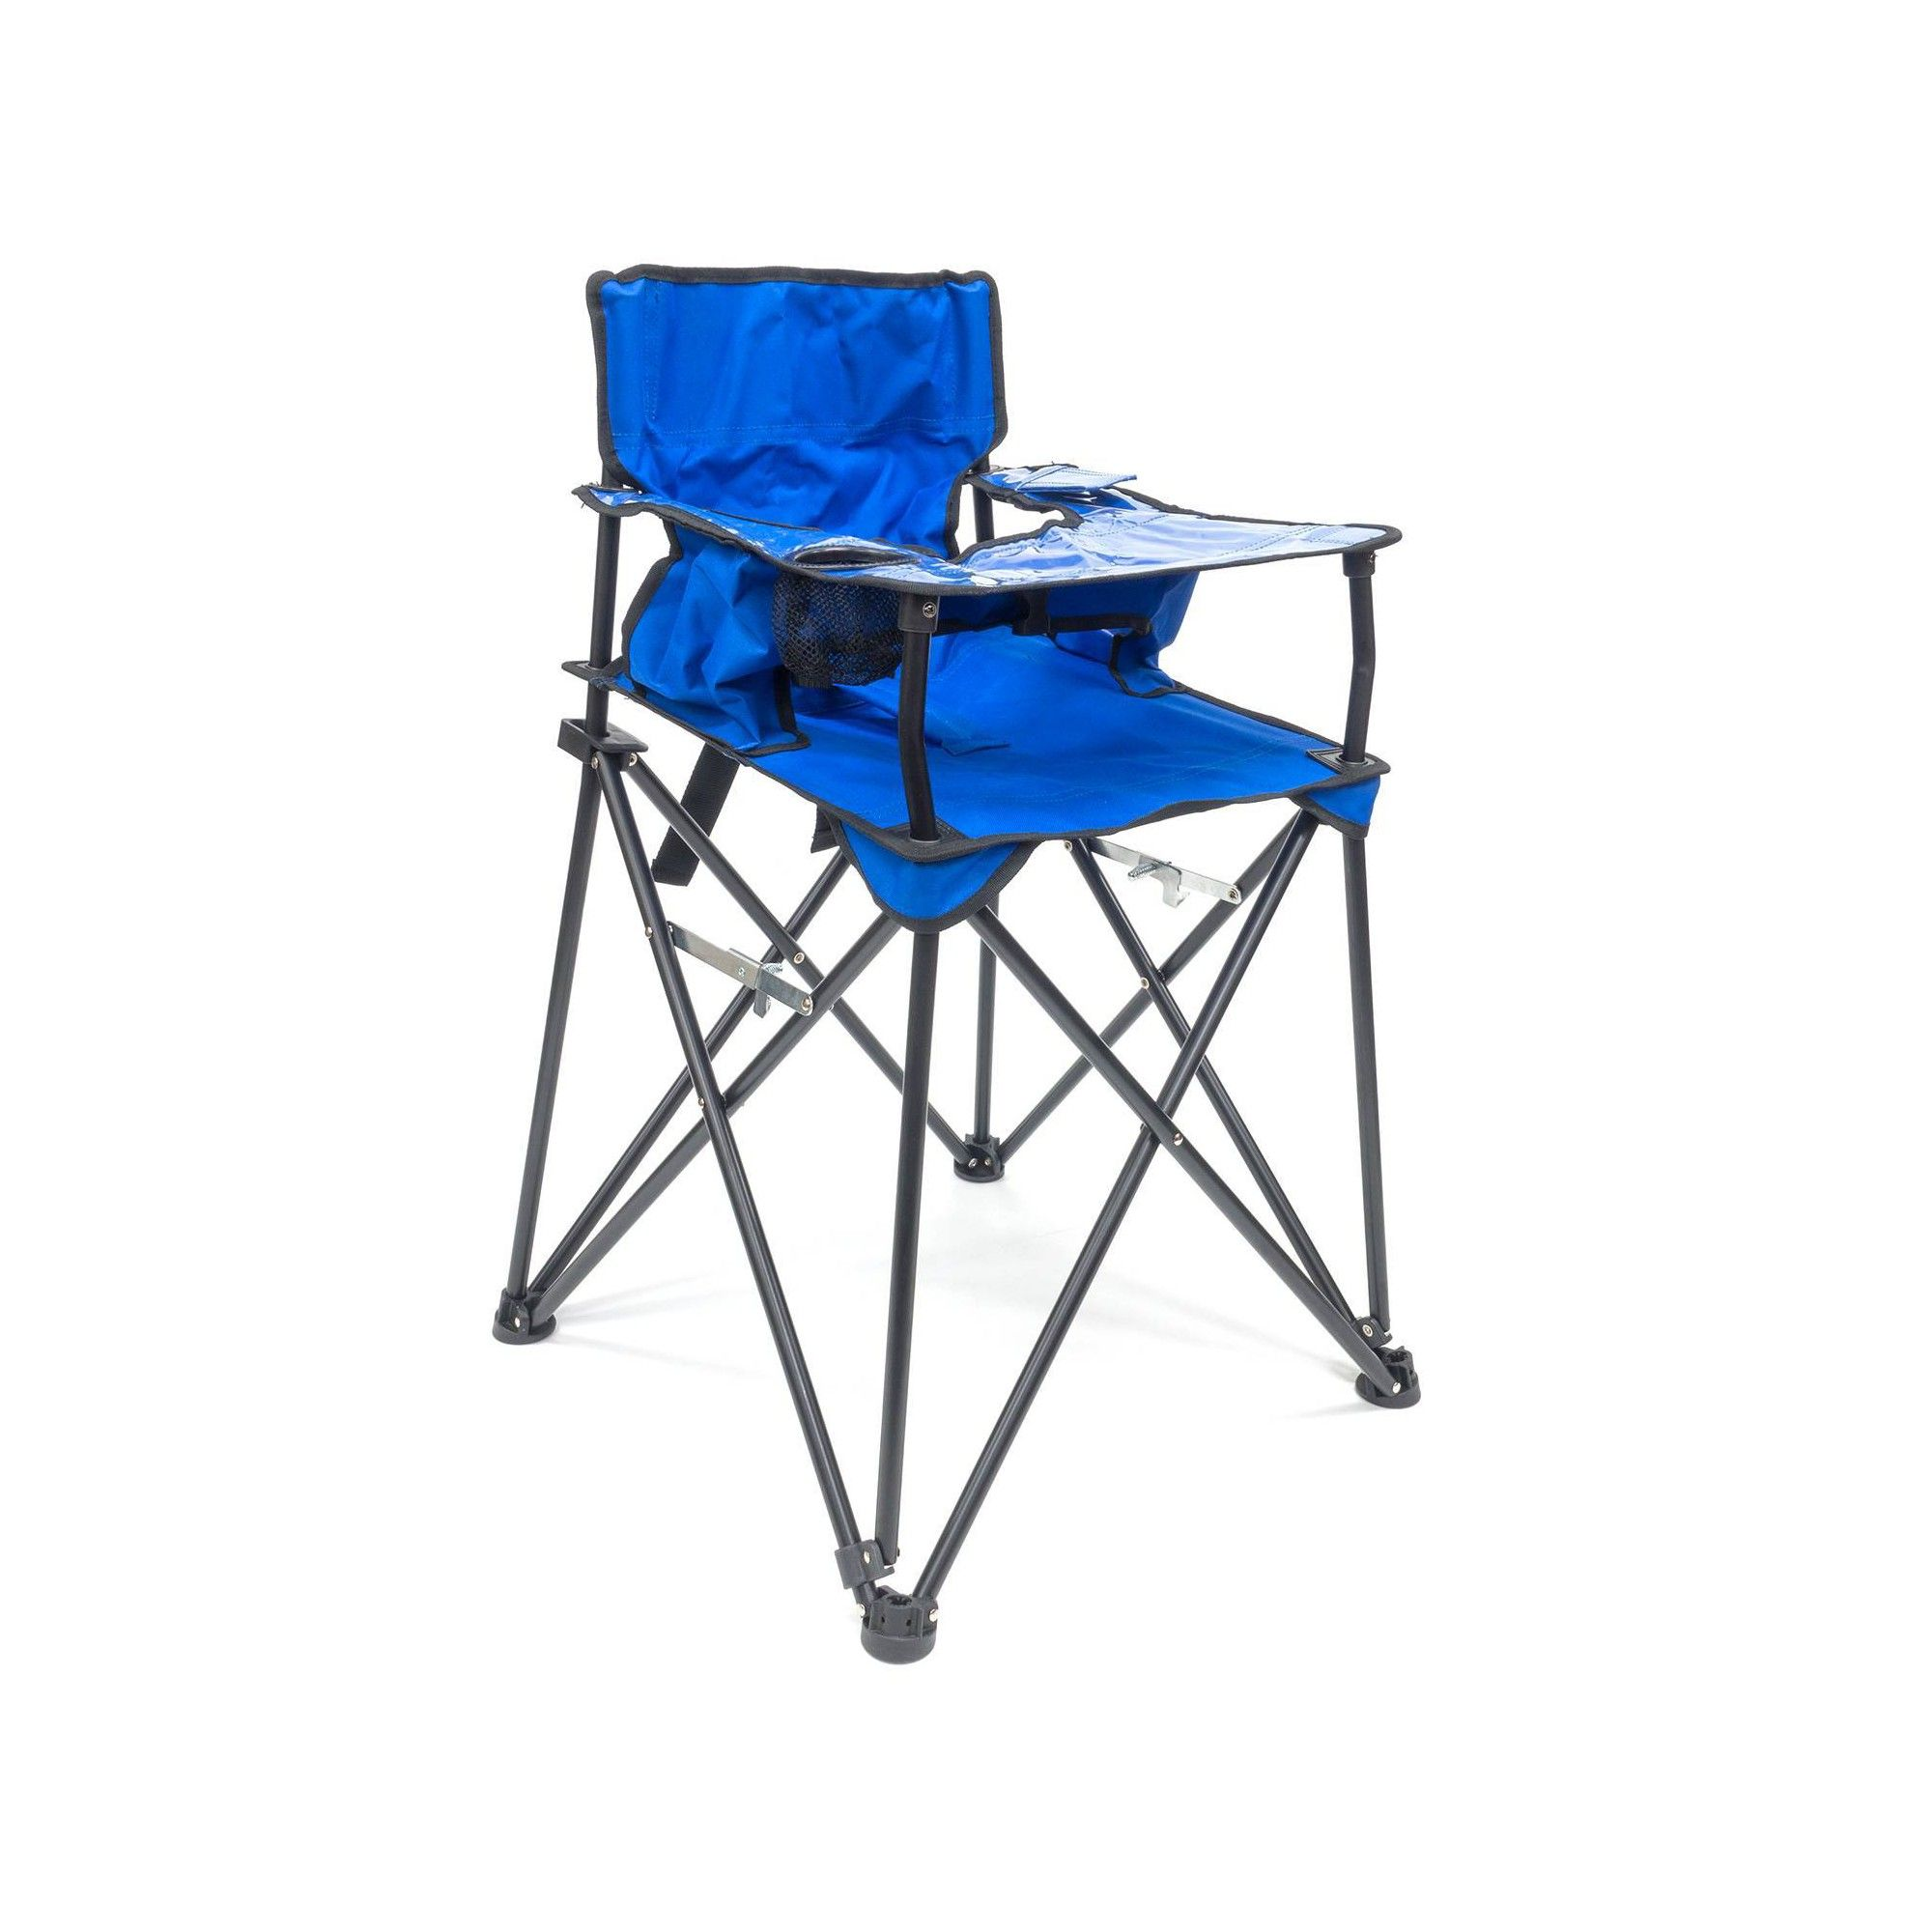 Creative Outdoor Distributor Baby High Folding Chair Blue Folding High Chair Folding Chair Baby High Chair